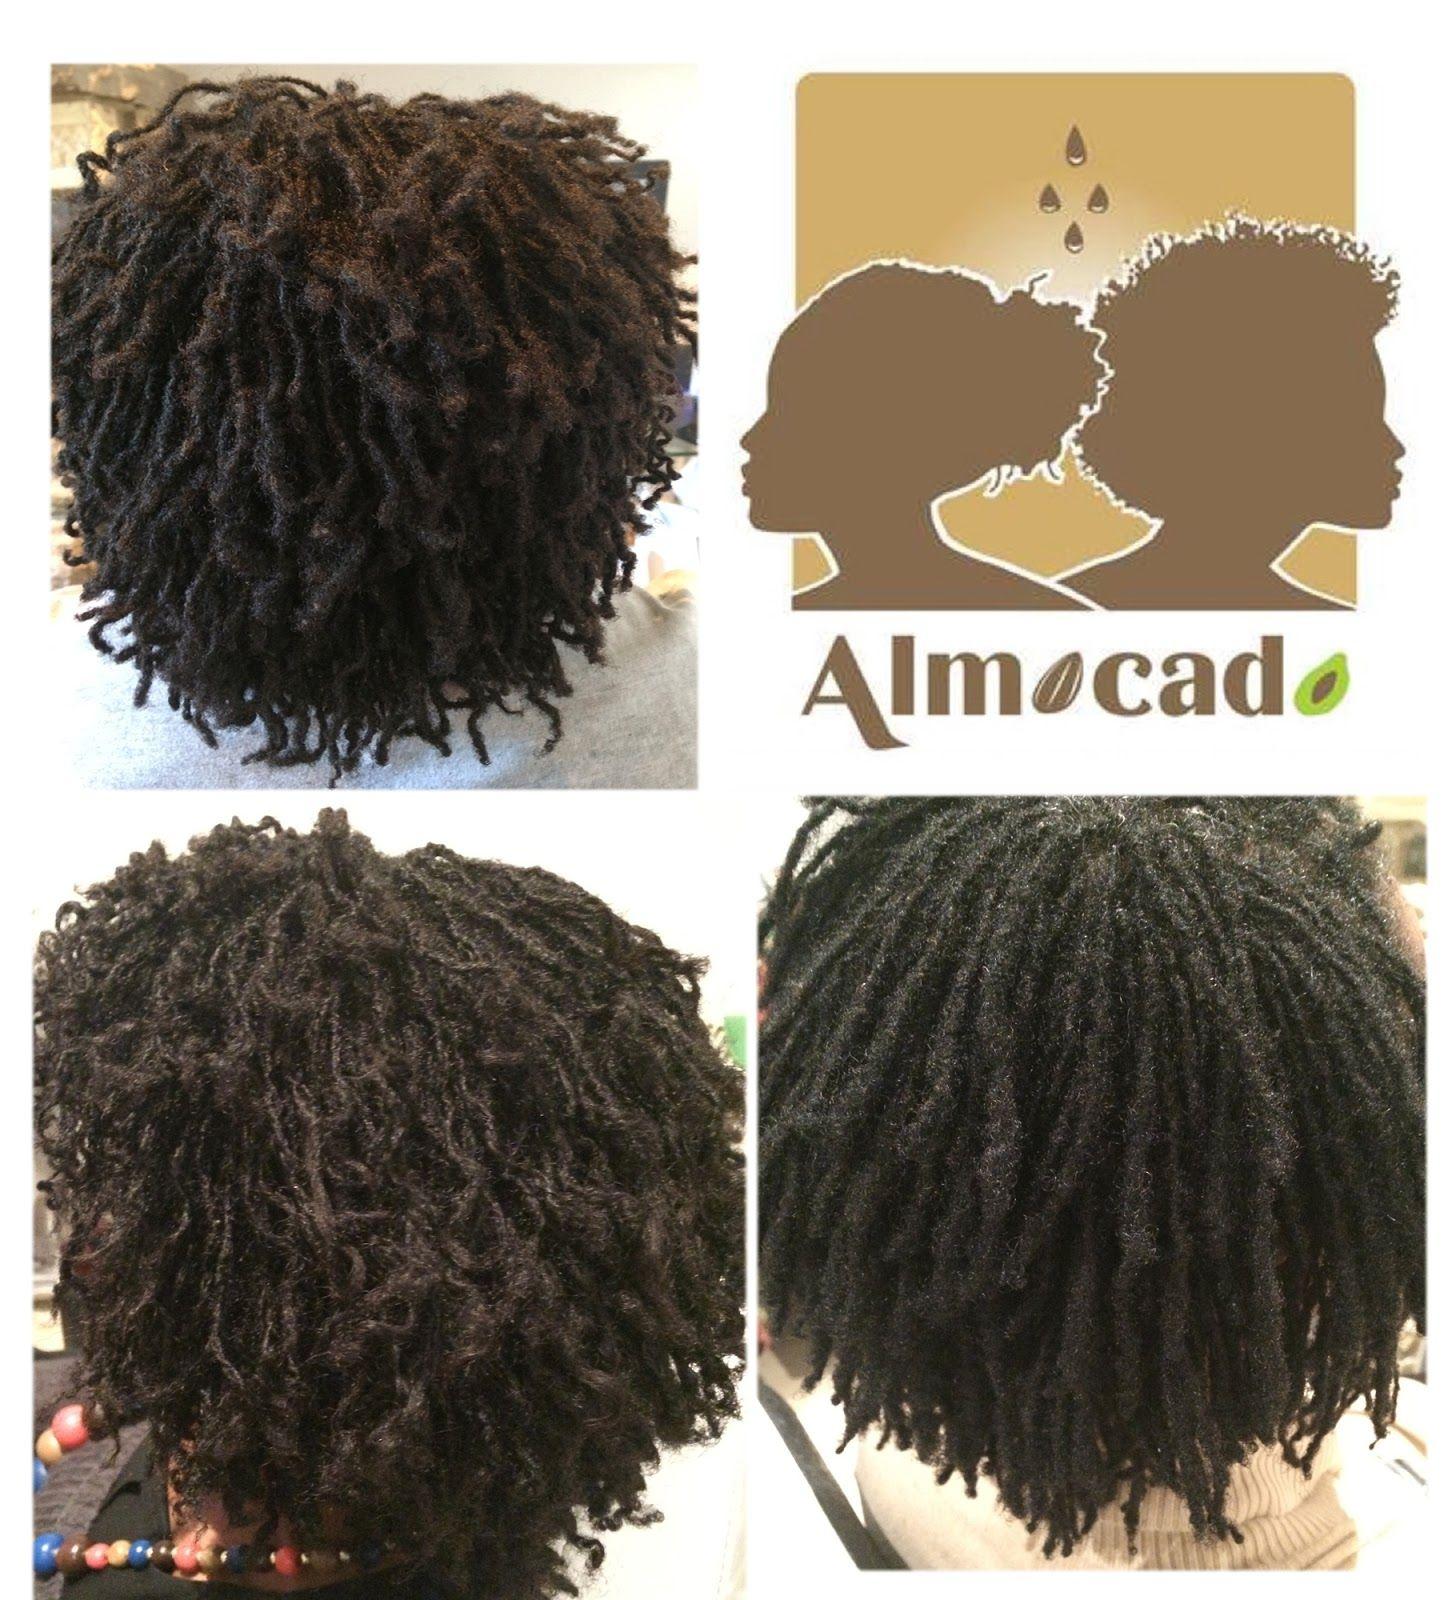 Almocado sisterlocks and holistic hair u body services no two